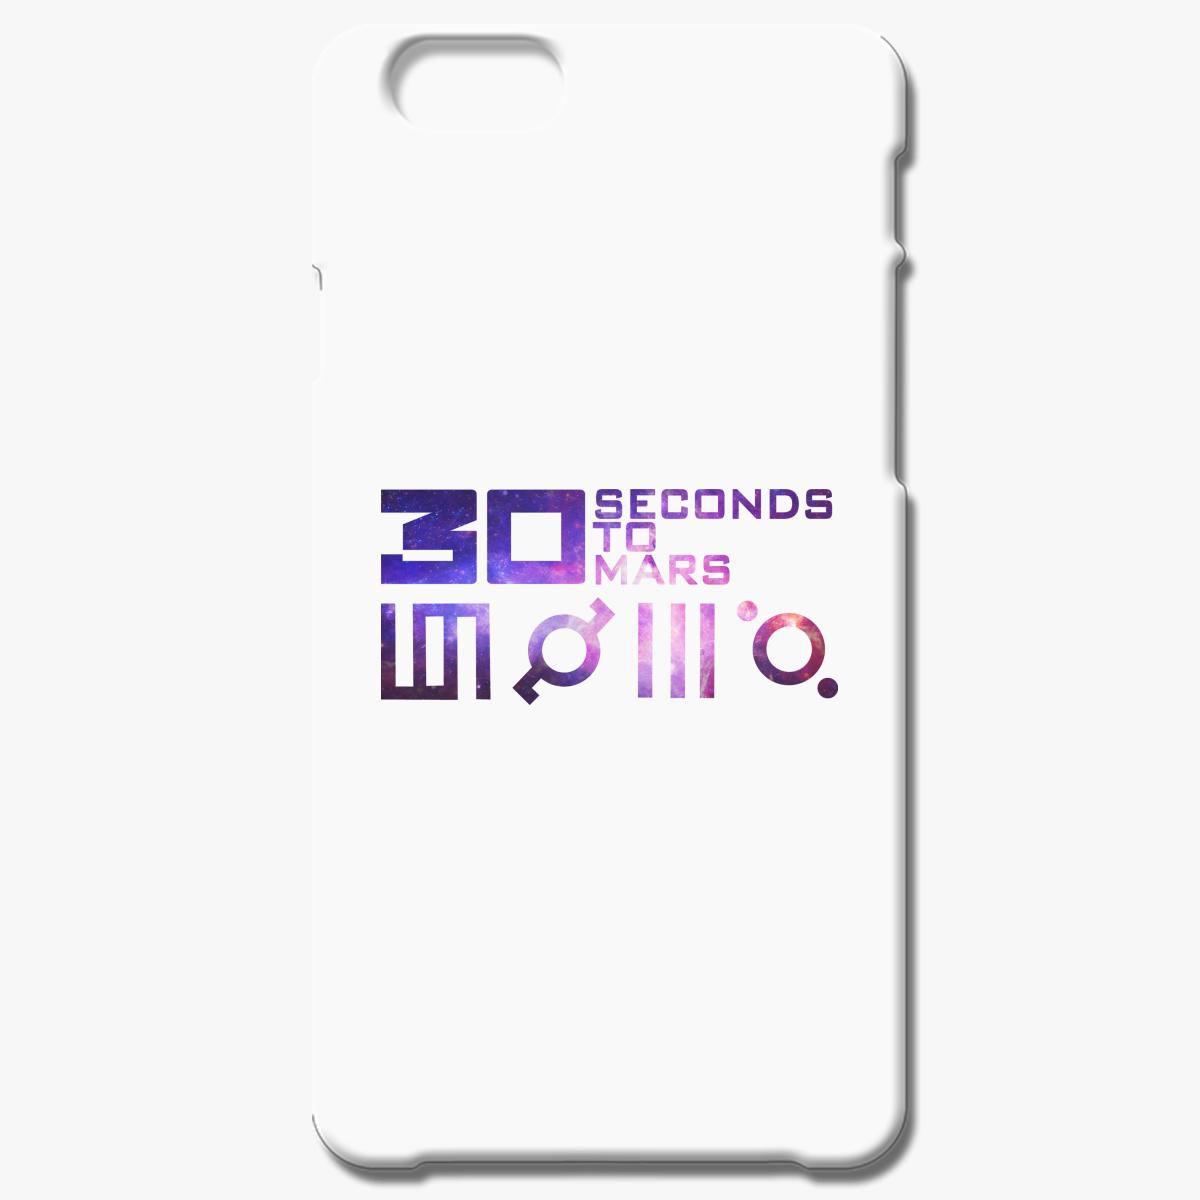 30 Seconds To Mars Iphone 6 6s Plus Case